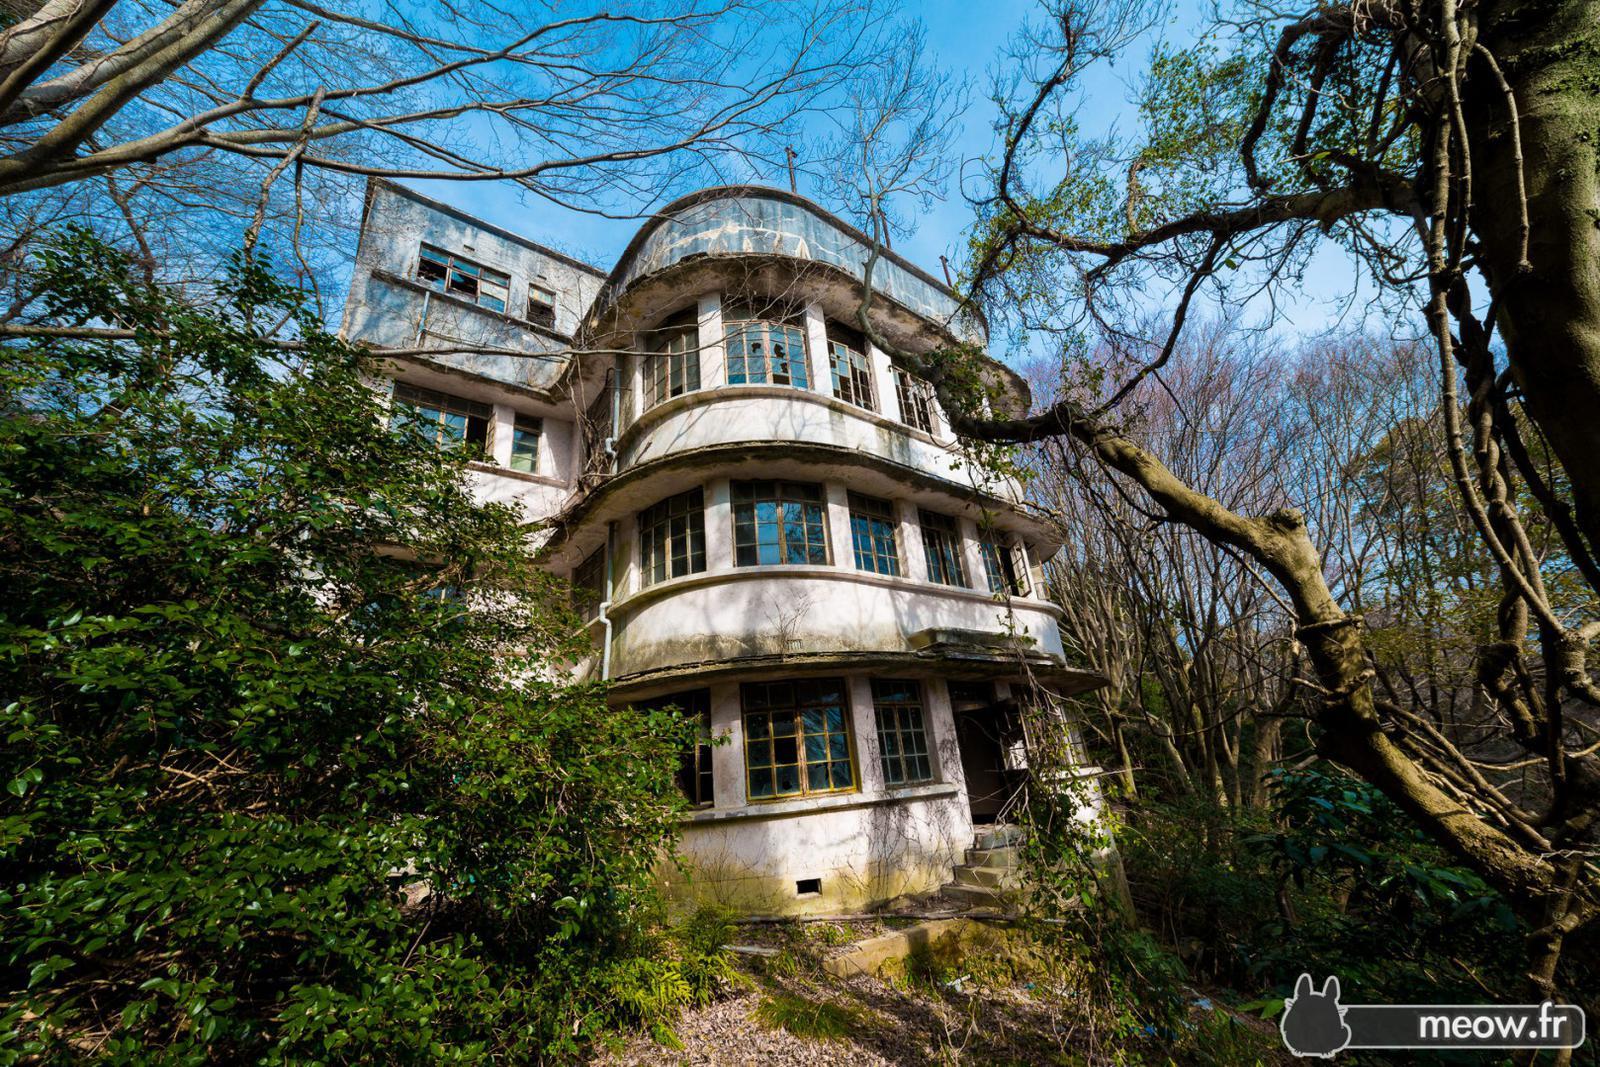 Maya Hotel - hôtel abandonné - Kobe